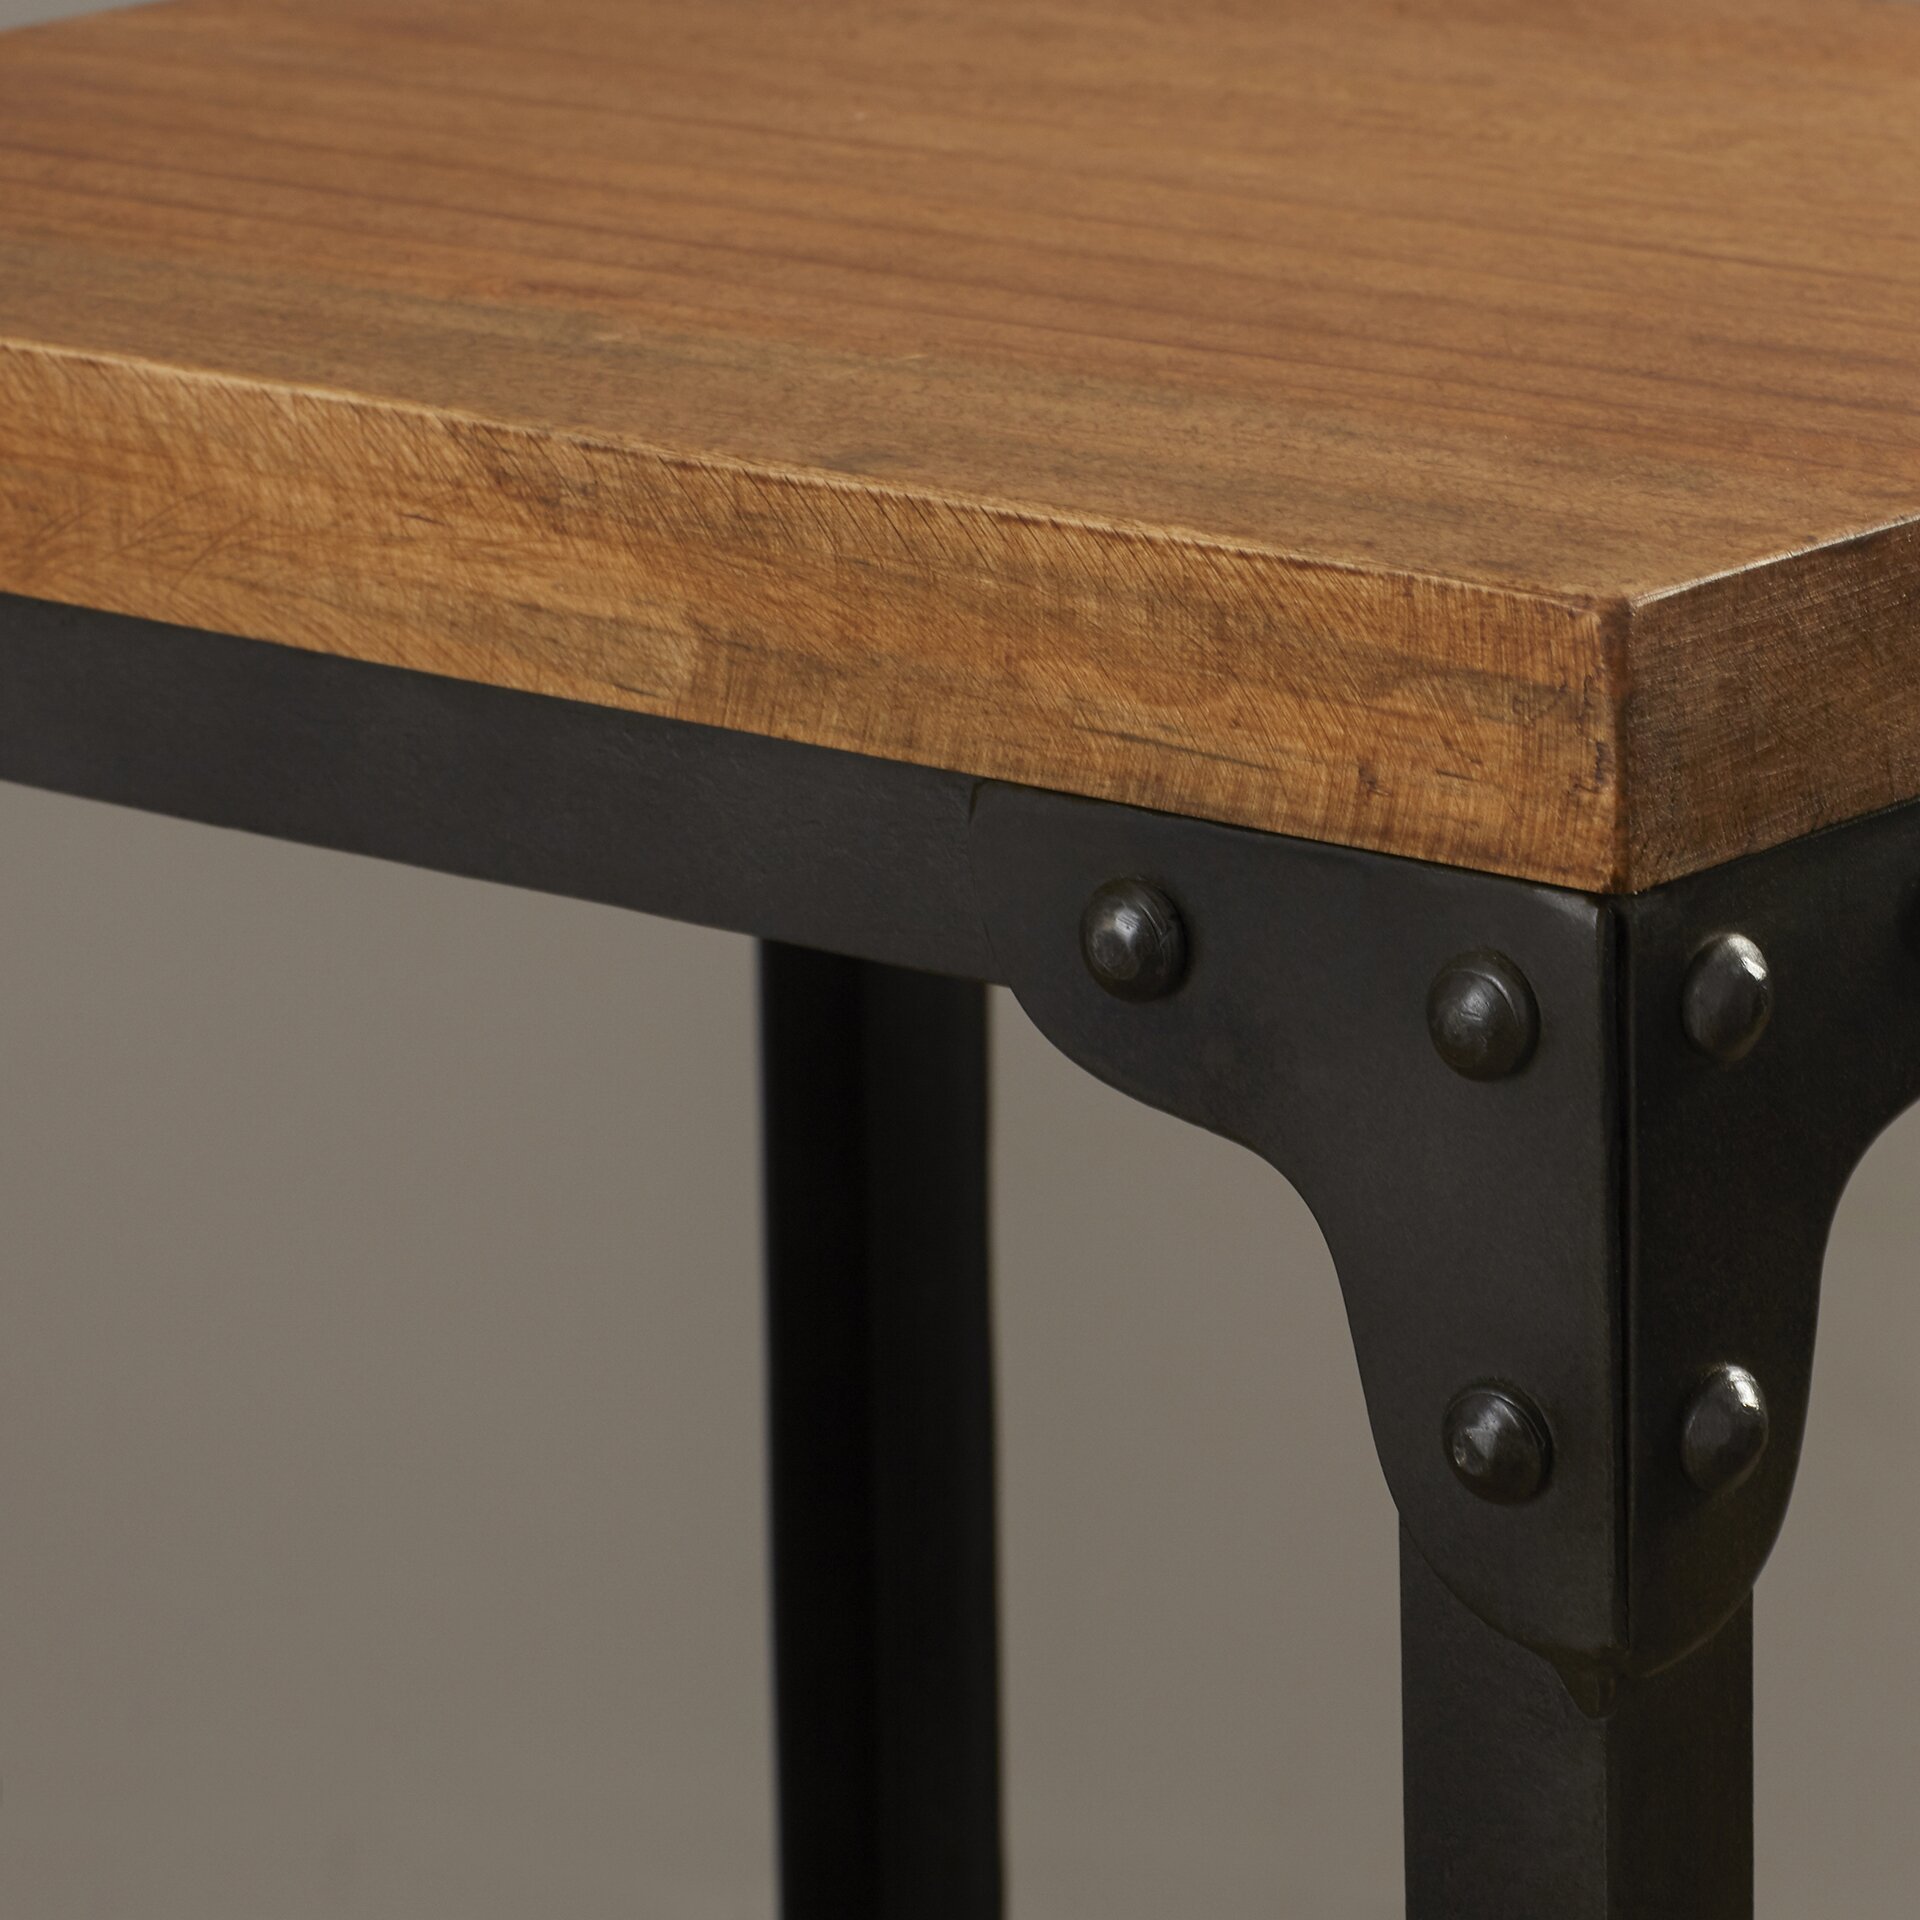 Trent Austin Design Almaden Pedestal Plant Stand & Reviews